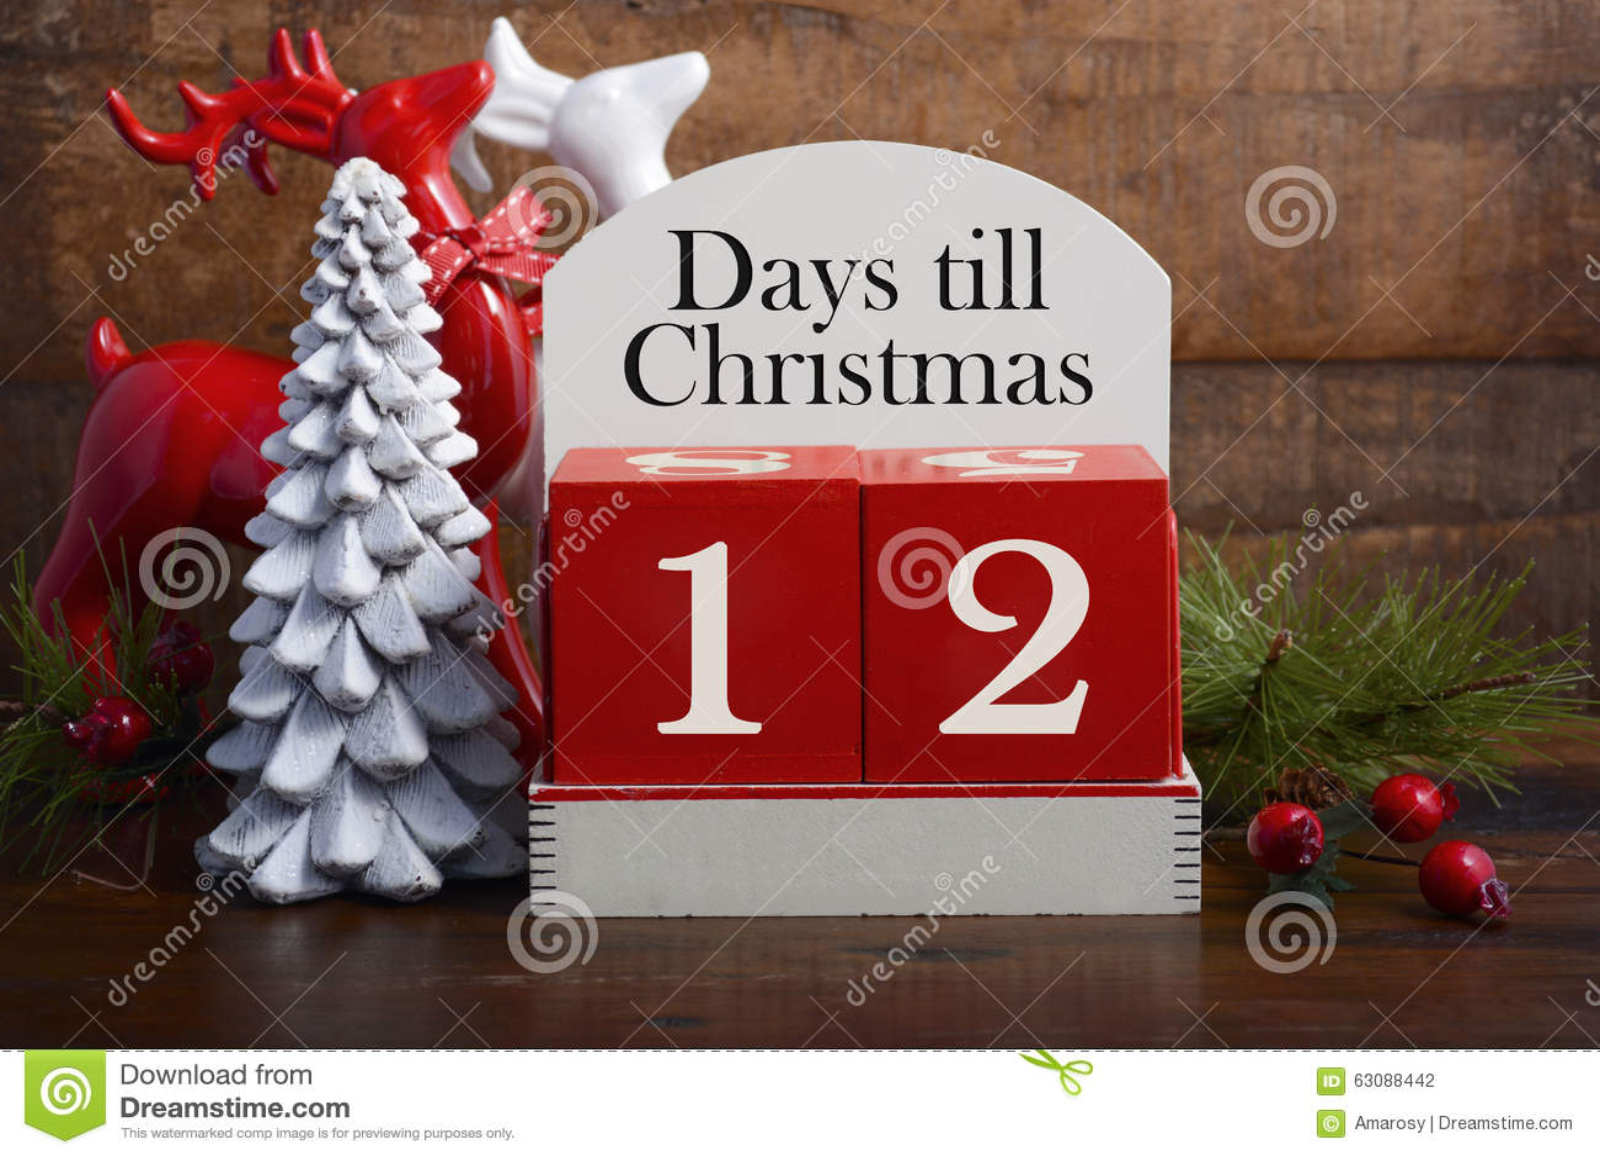 days till christmas calendar - Number Of Days Until Christmas